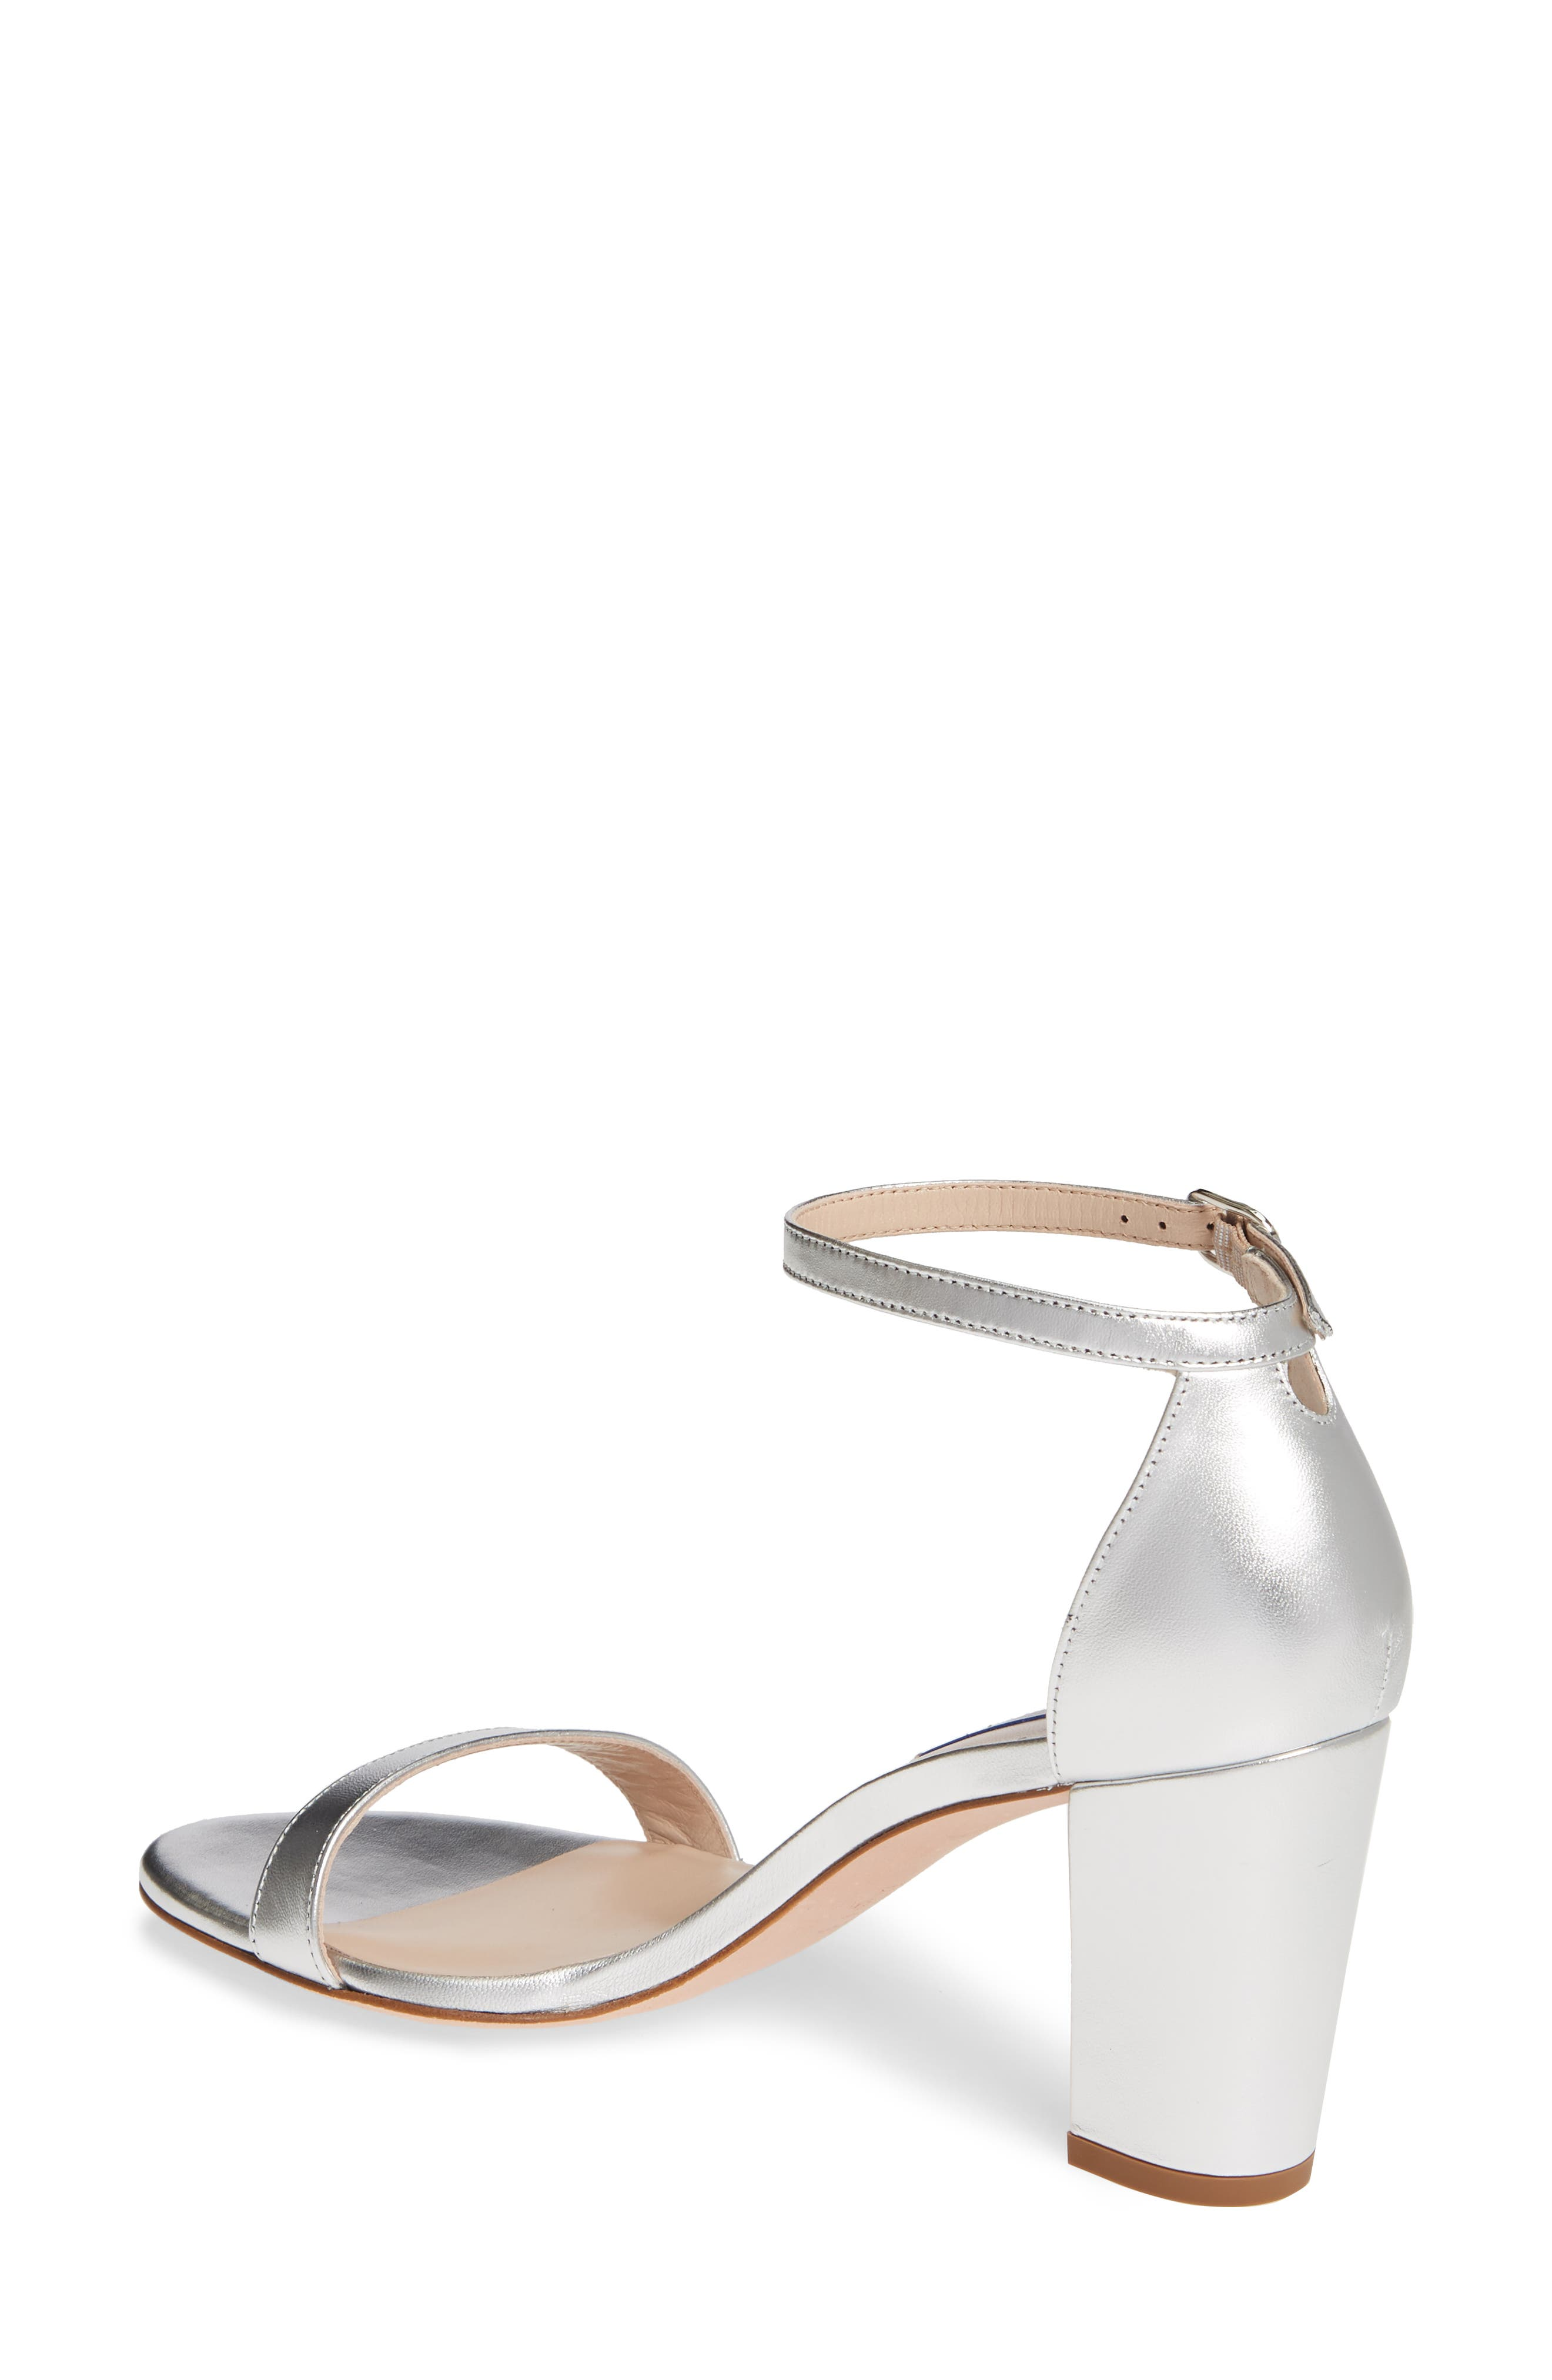 STUART WEITZMAN,                             NearlyNude Ankle Strap Sandal,                             Alternate thumbnail 2, color,                             SILVER METALLIC NAPPA